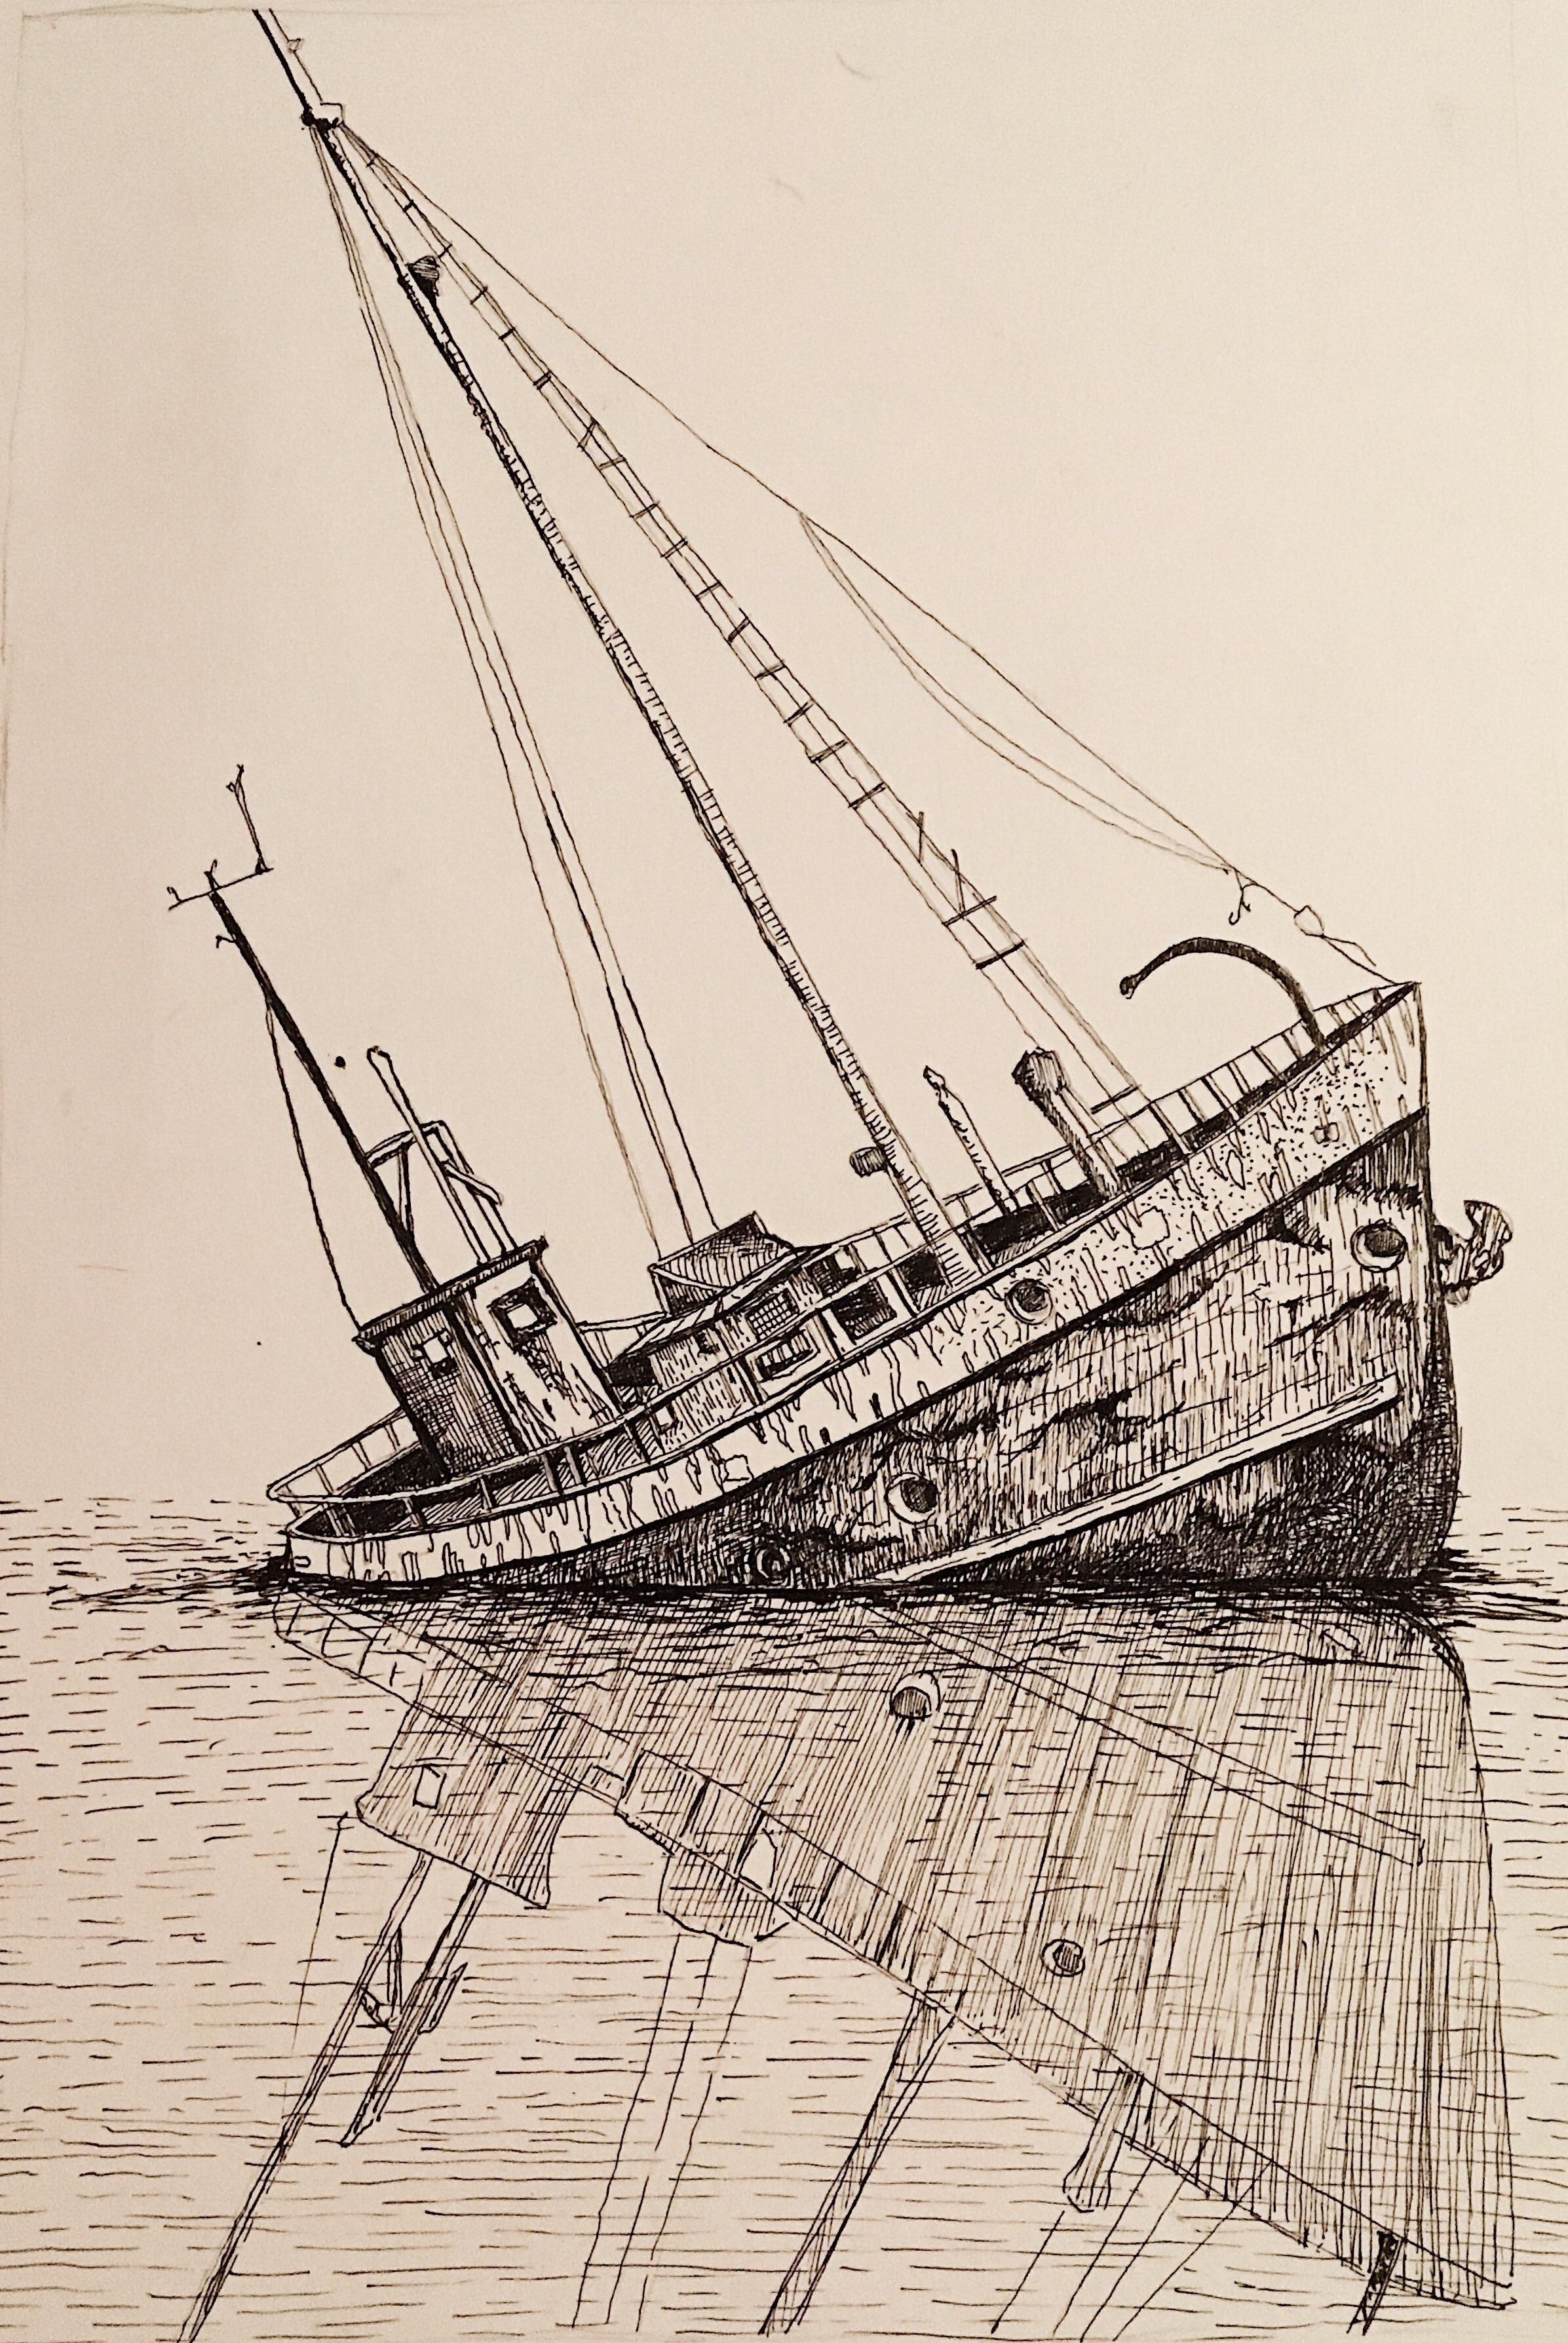 Sinking Ship Pen Amp Ink 9inx12in In